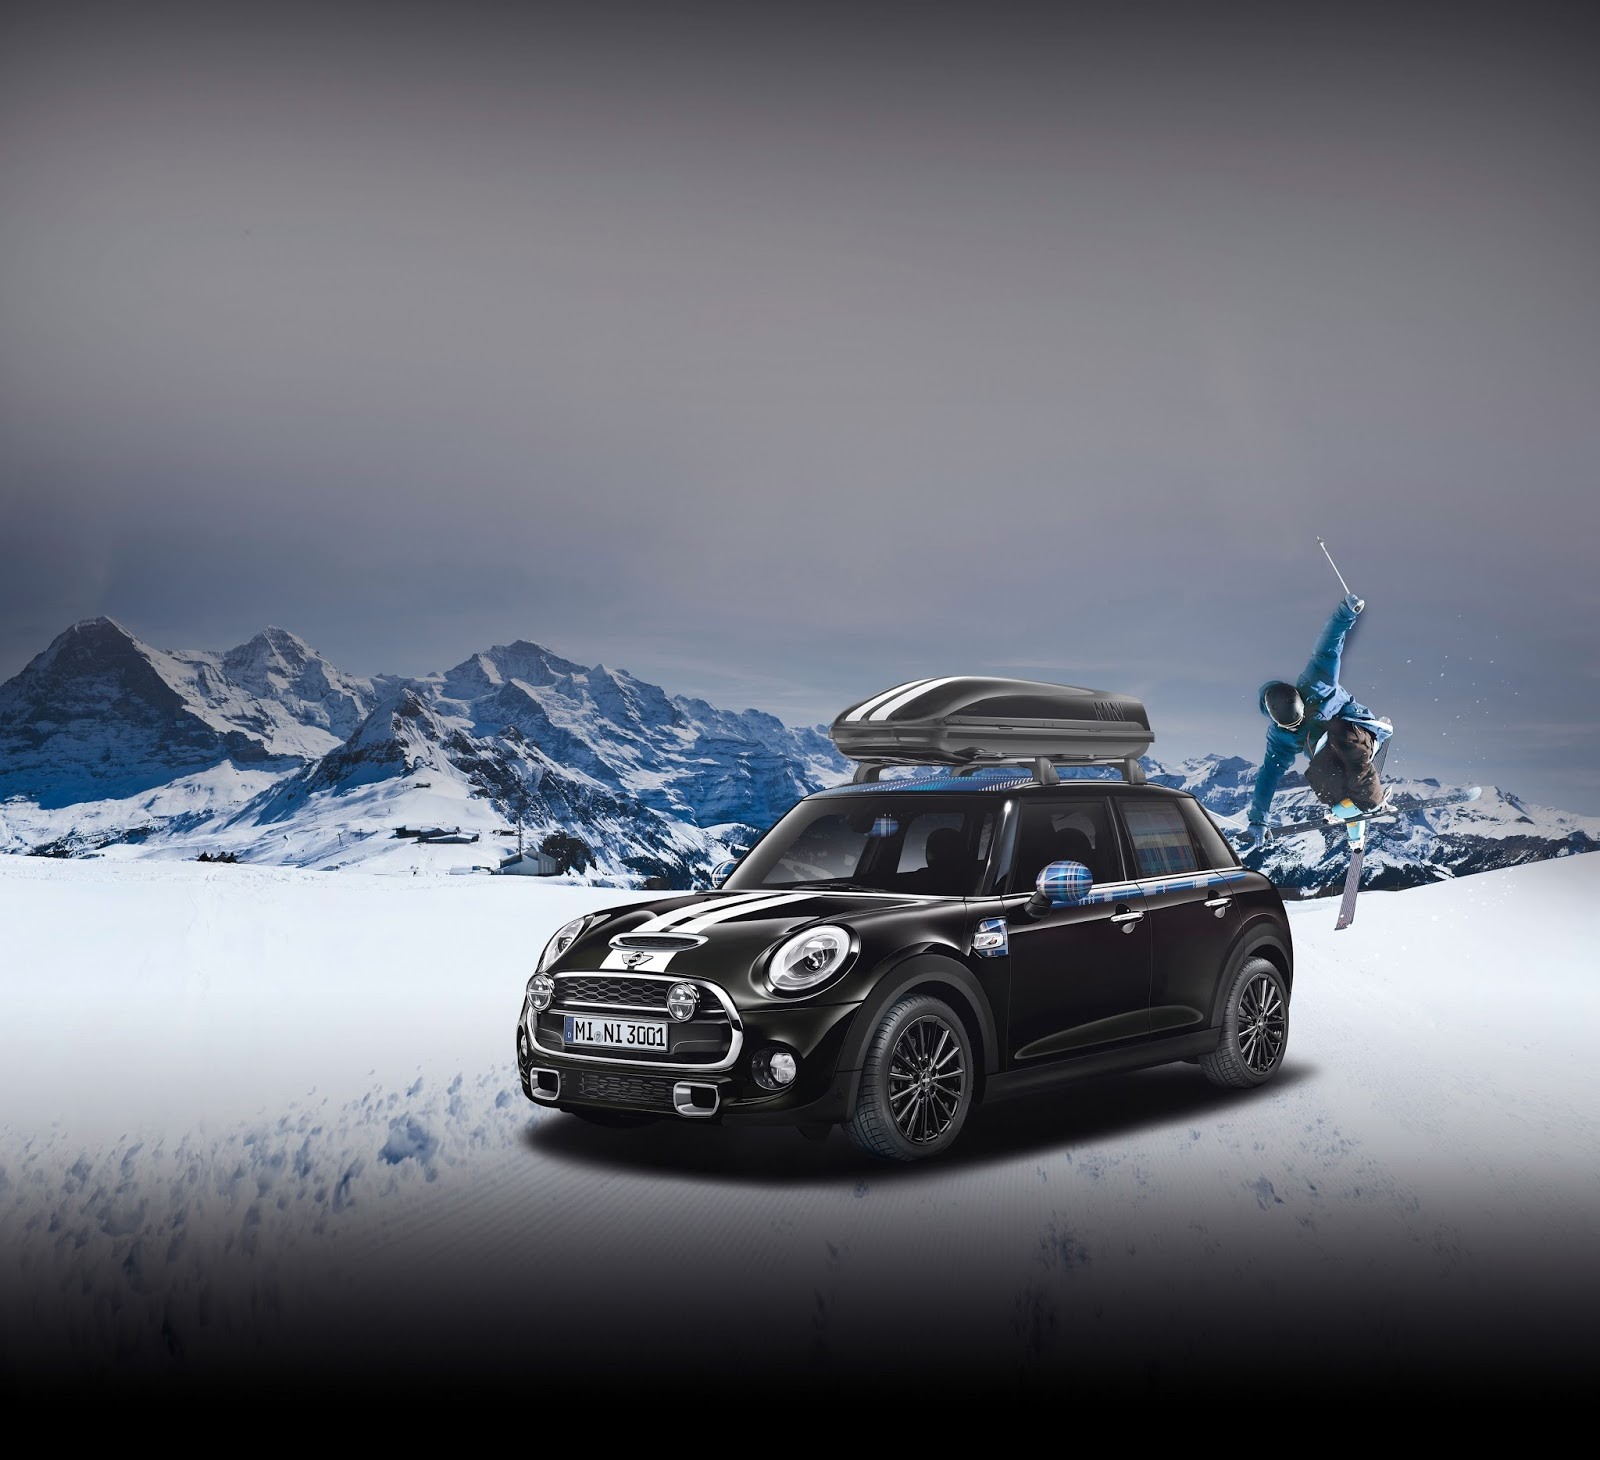 P90203805 highRes miniwinter campaign Δωρεάν χειμερινός έλεγχος για όλα τα Mini Mini, MINI Cooper, MINI Service